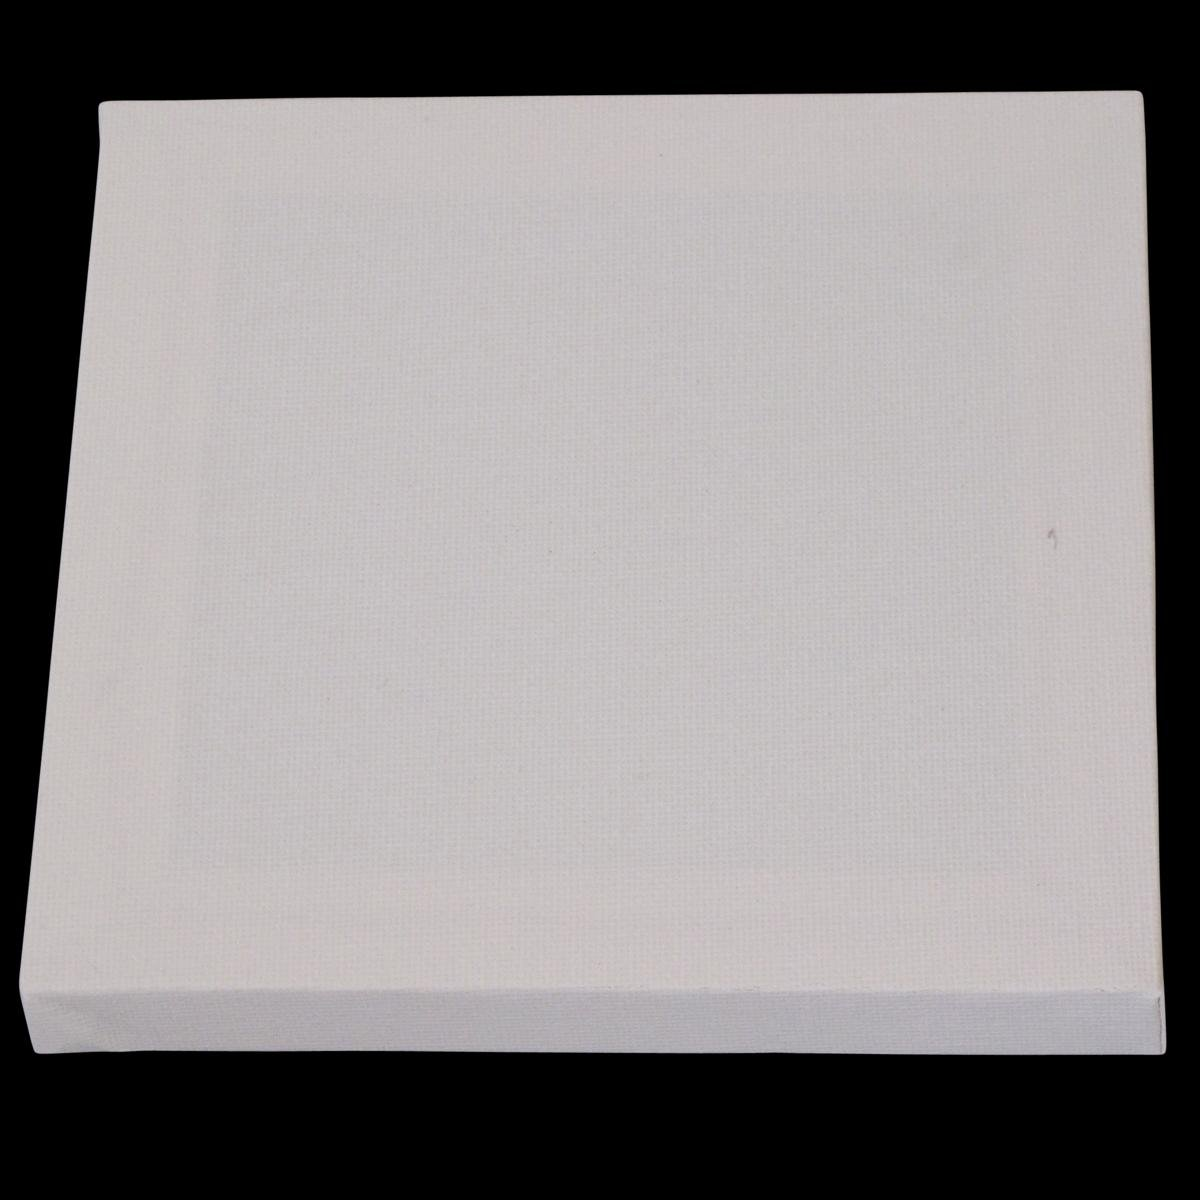 15cm x 15cm Flat Canvas 6 x 6 Set of 12 Artists Blank Canvas